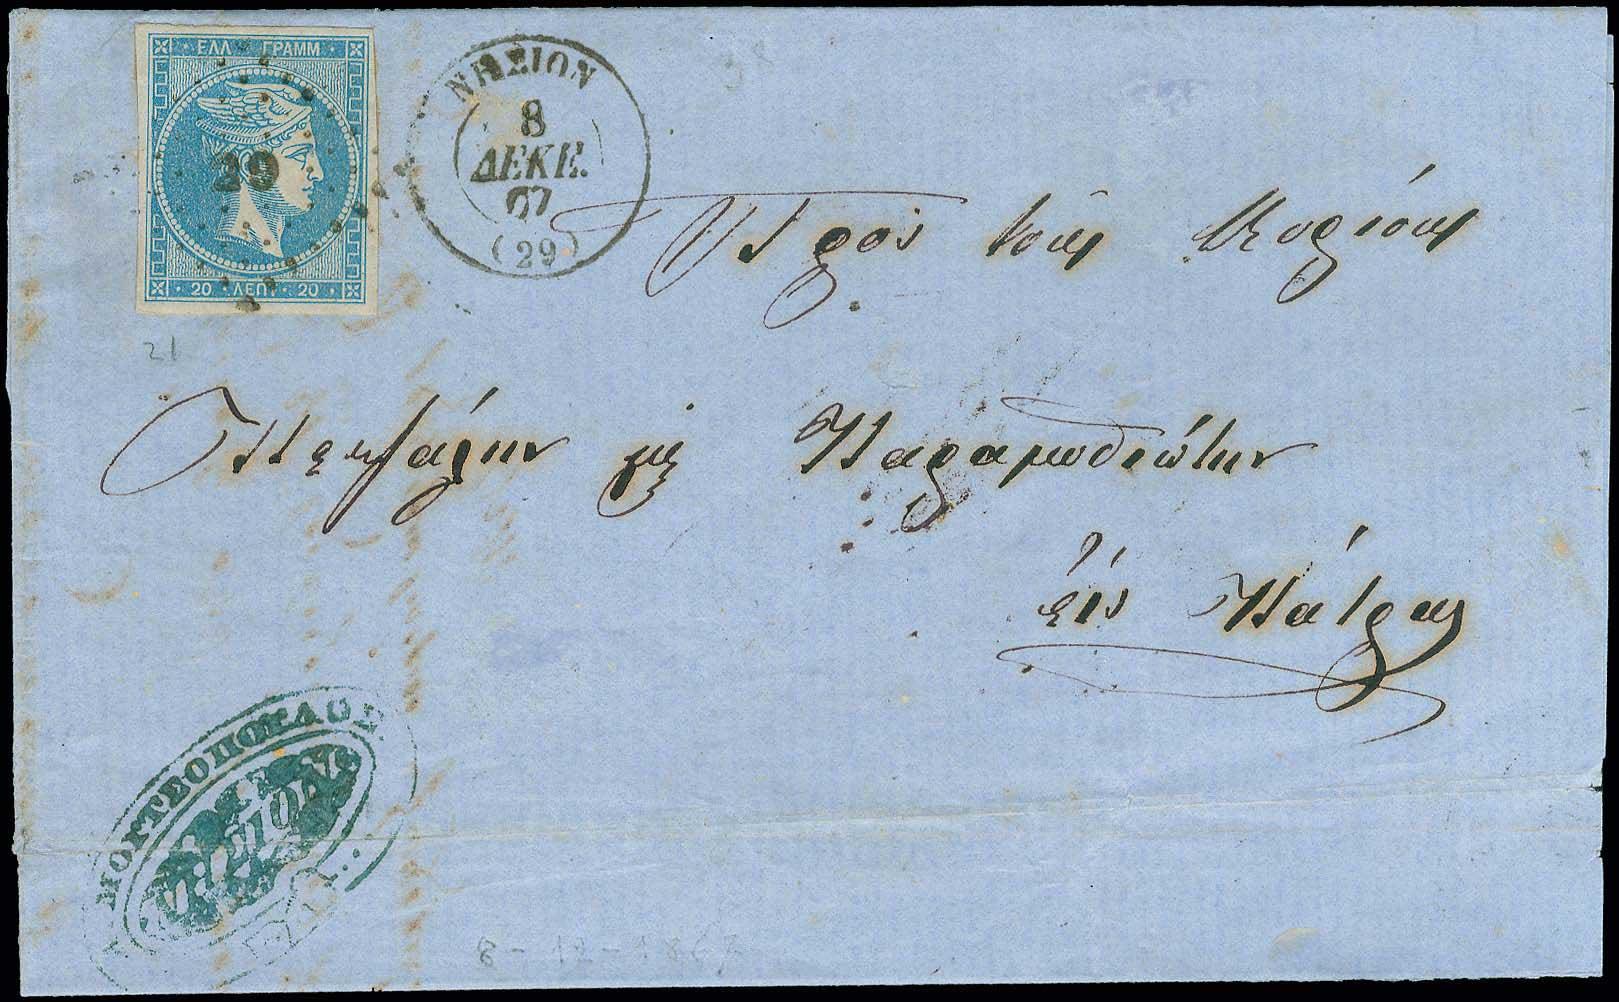 Lot 100 - large hermes head 1862/67 consecutive athens printings -  A. Karamitsos Postal & Live Internet Auction 680 General Philatelic Auction